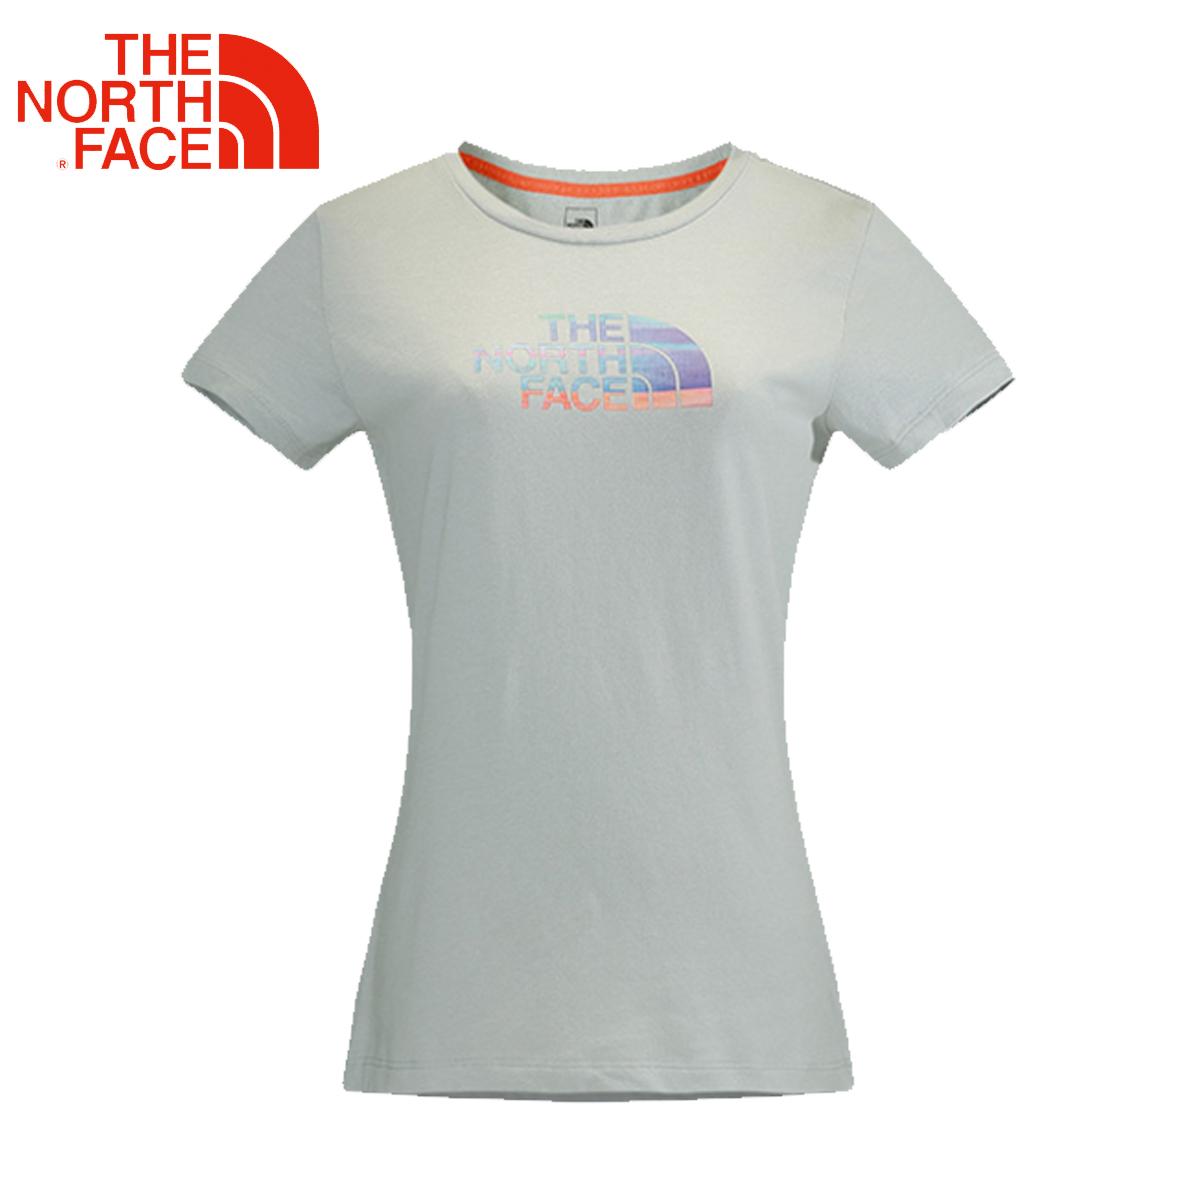 TheNorthFace北面春夏女户外透气舒适圆领休闲短袖T恤CE1Z